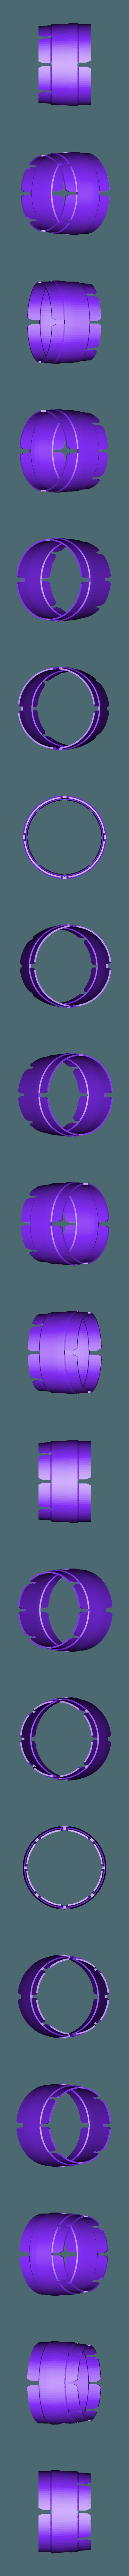 Rear_Fuselage_Connector.stl Download free STL file Flyer Mk. 1 • 3D printing object, billbo1958